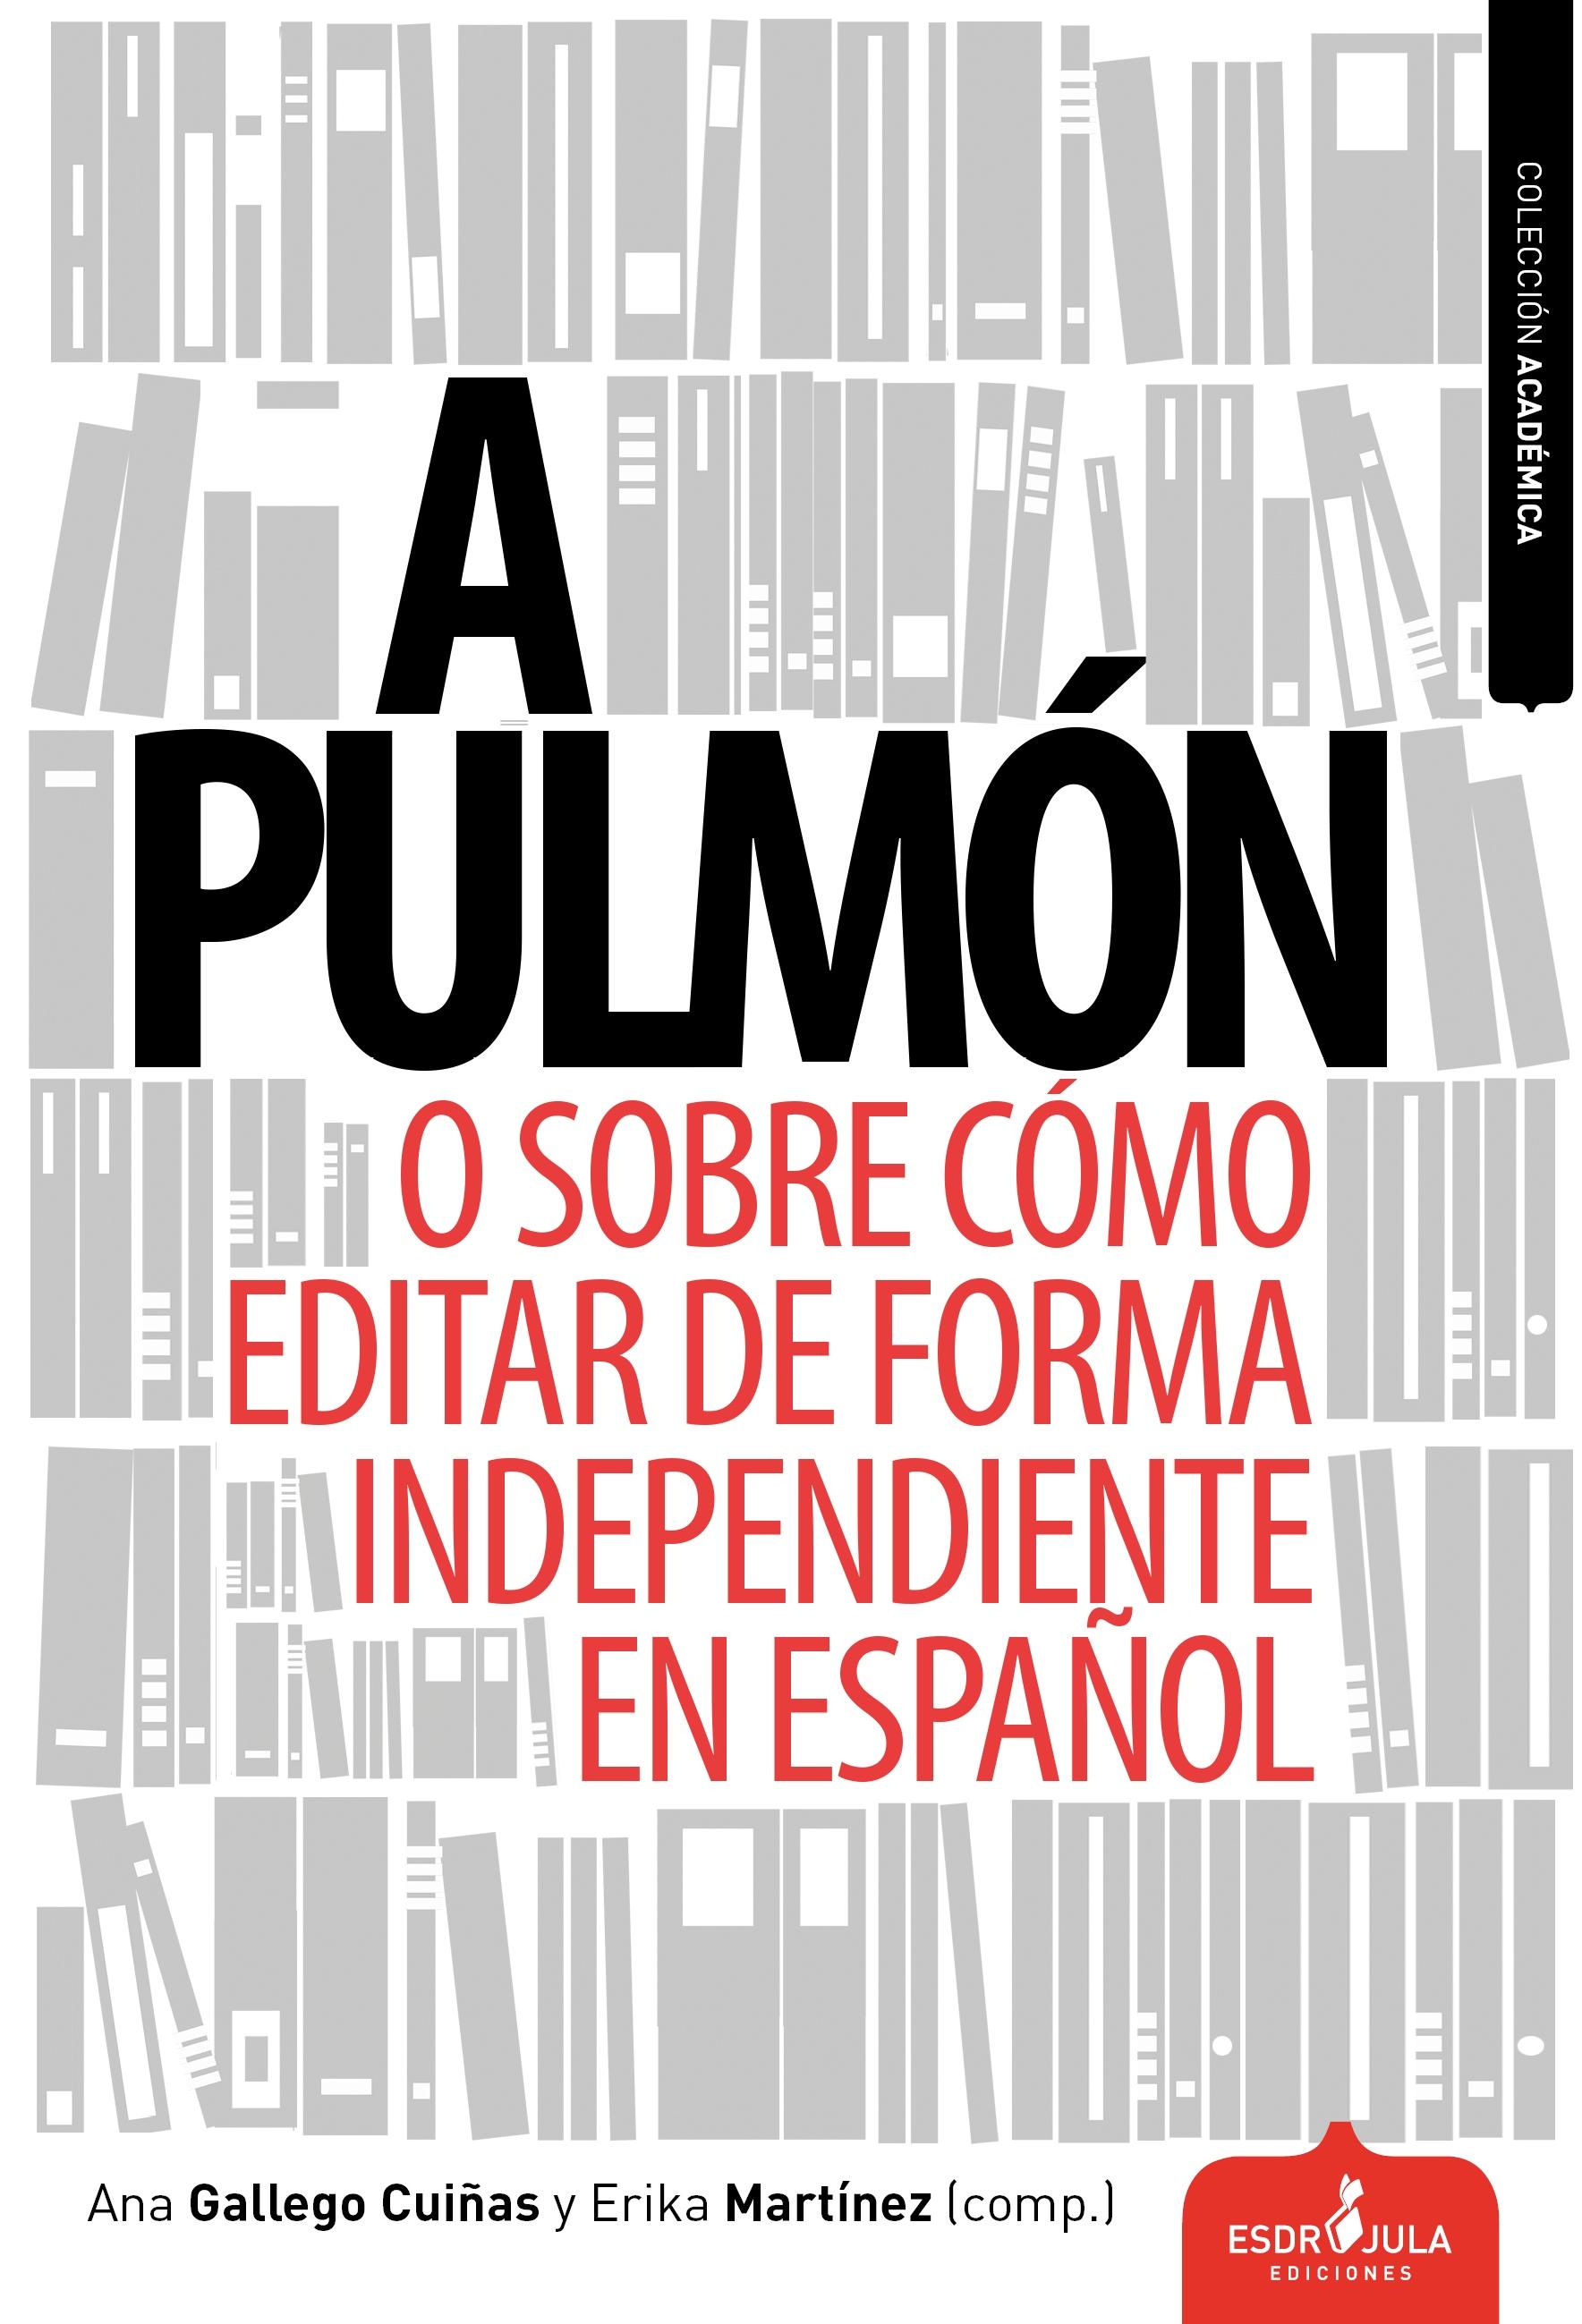 Ana Gallego Guiñas; Erika Martínez (comps.). A pulmón o sobre cómo editar de forma independiente en español. Esdrújula,